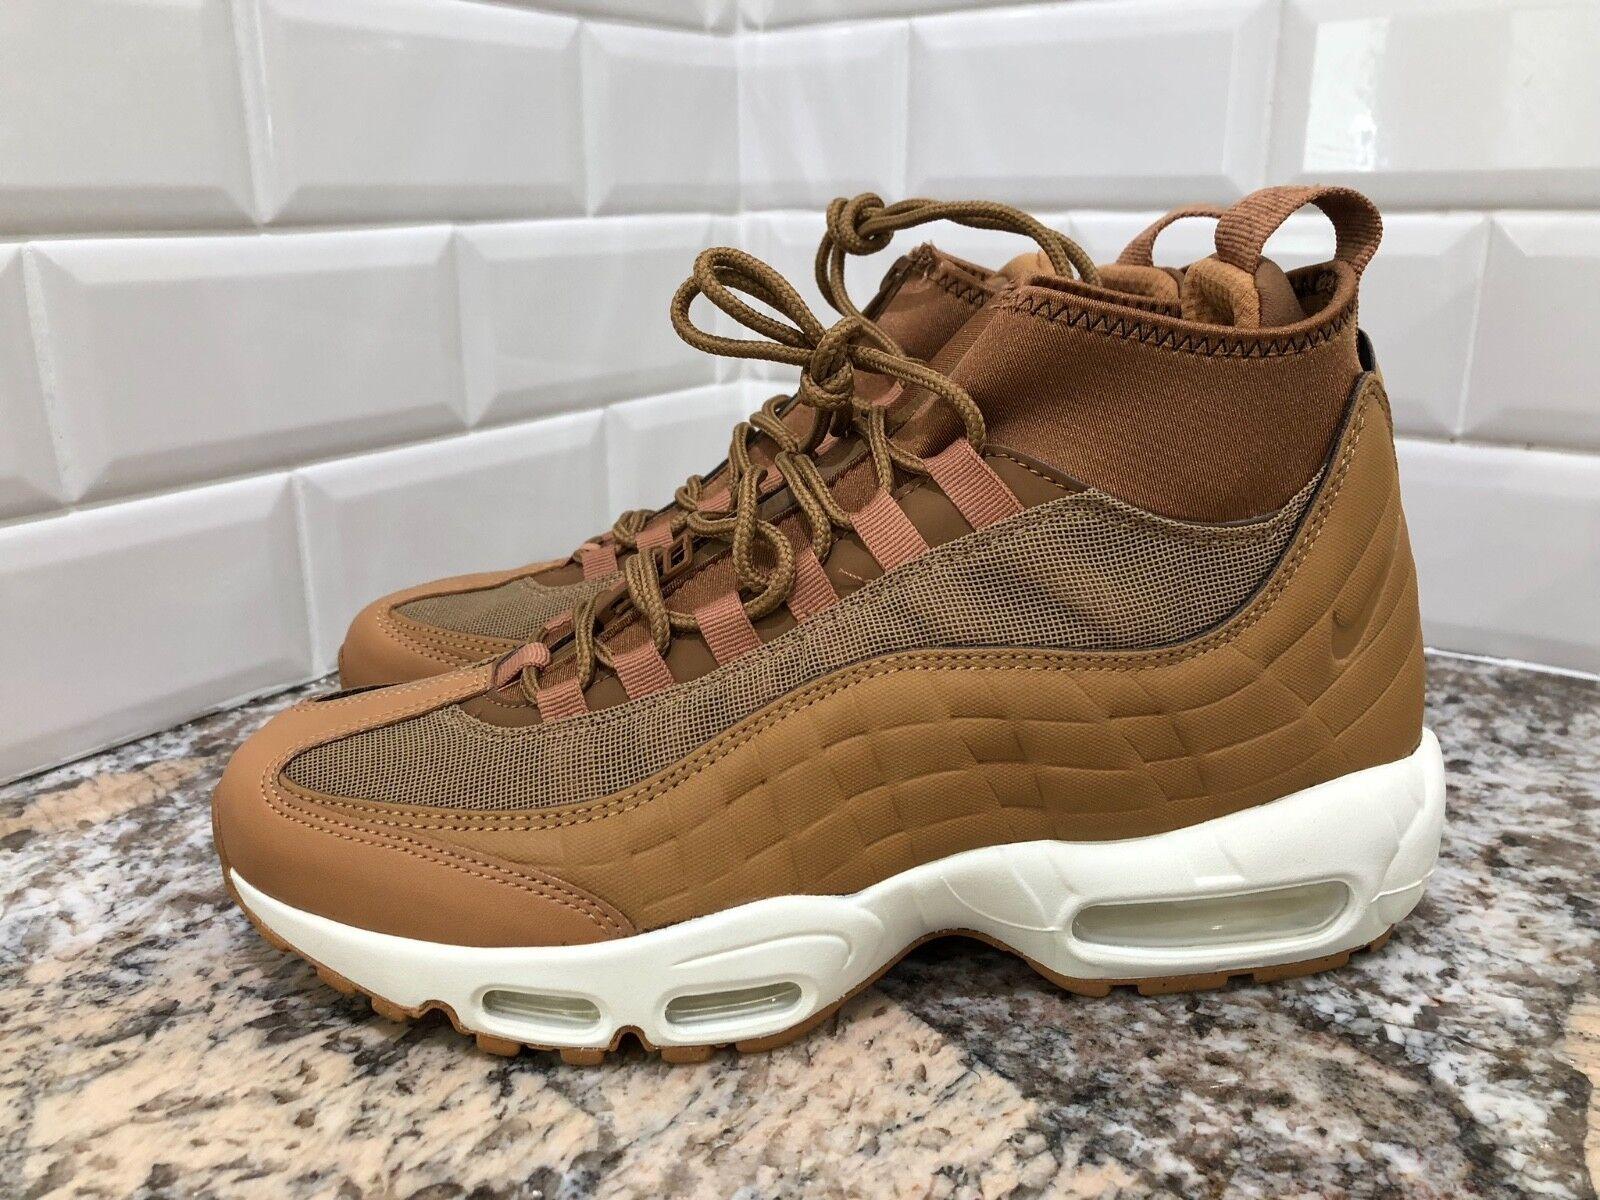 Nike air max 95 sneakerboot grano, lino ale brown gomma 806809-201 sz